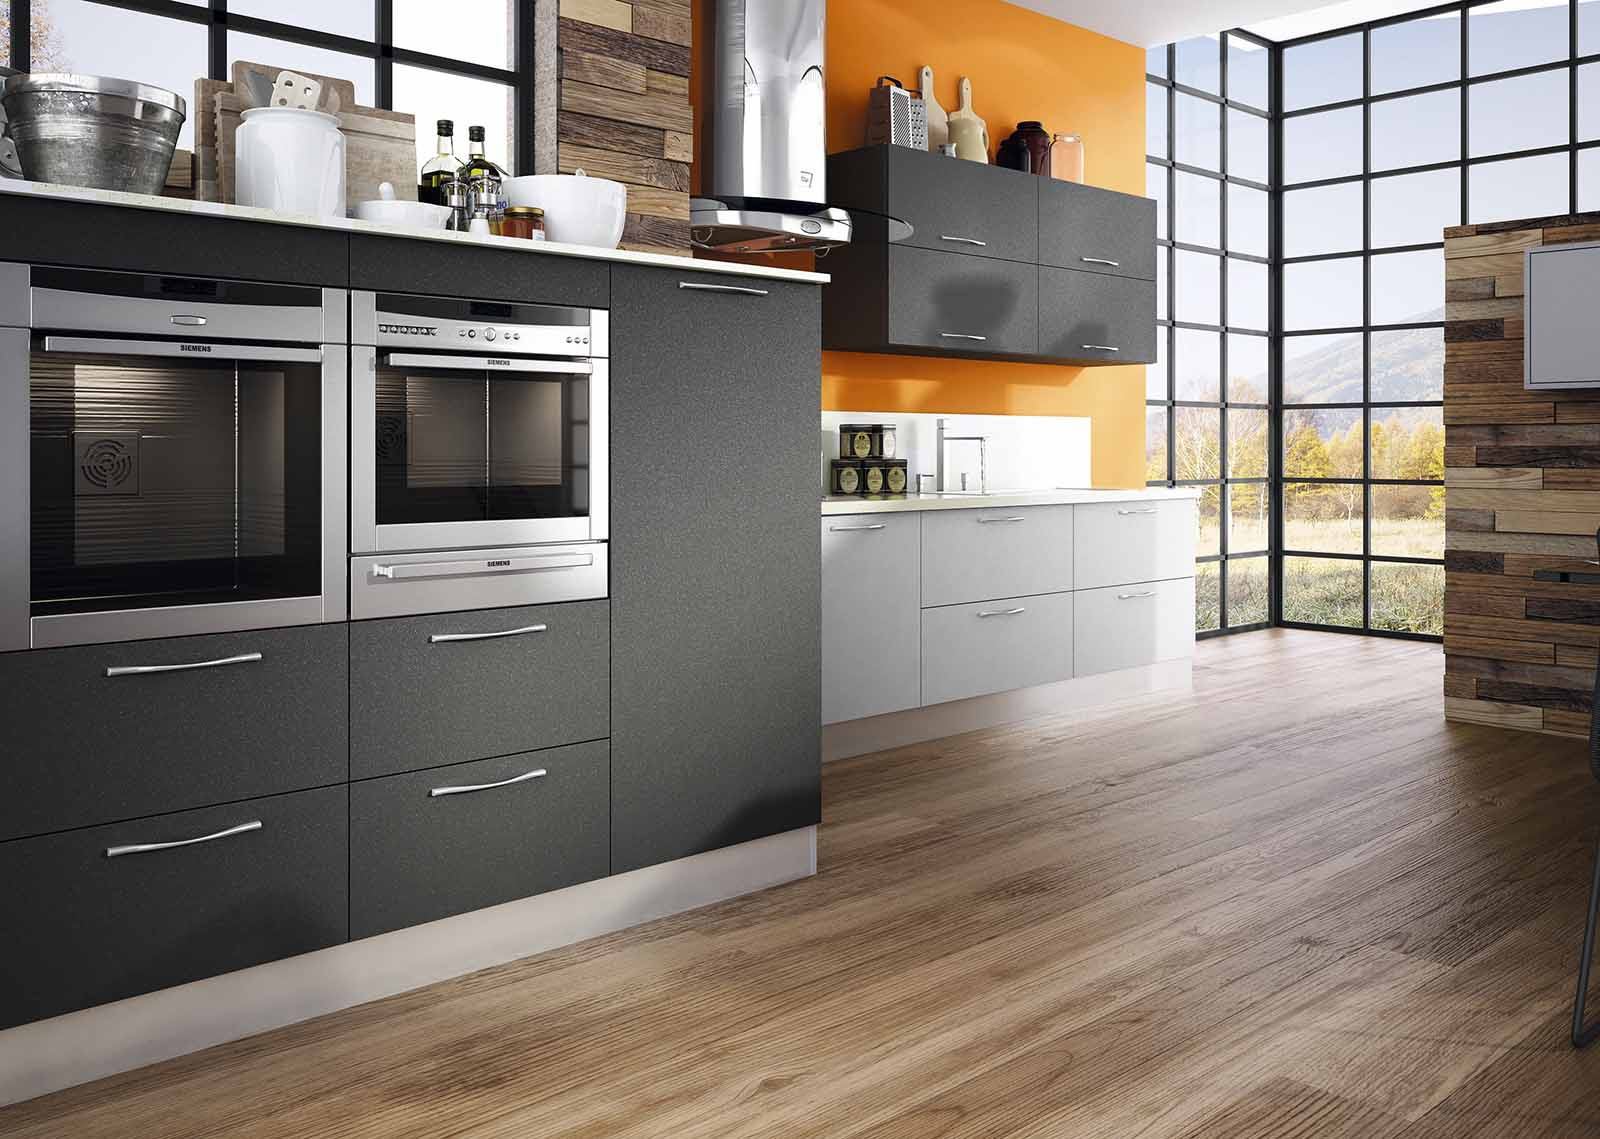 Cocina 08 cocinas capis dise o y fabricaci n de cocinas for Configurador de cocinas